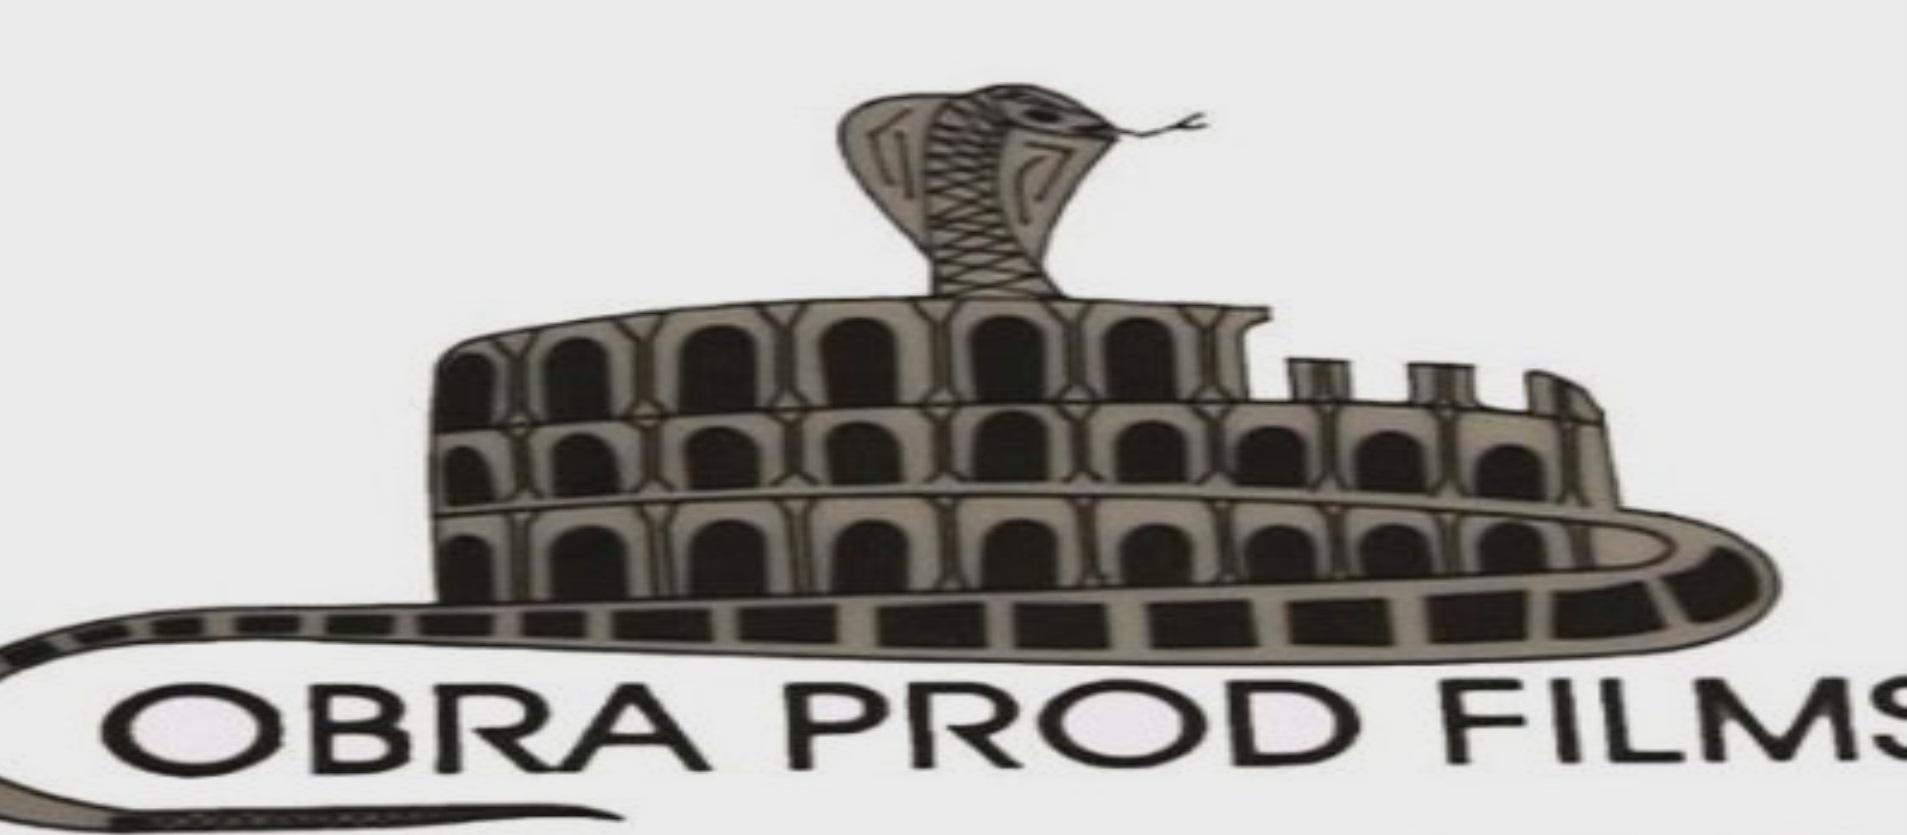 Multi-event & Cobra Production